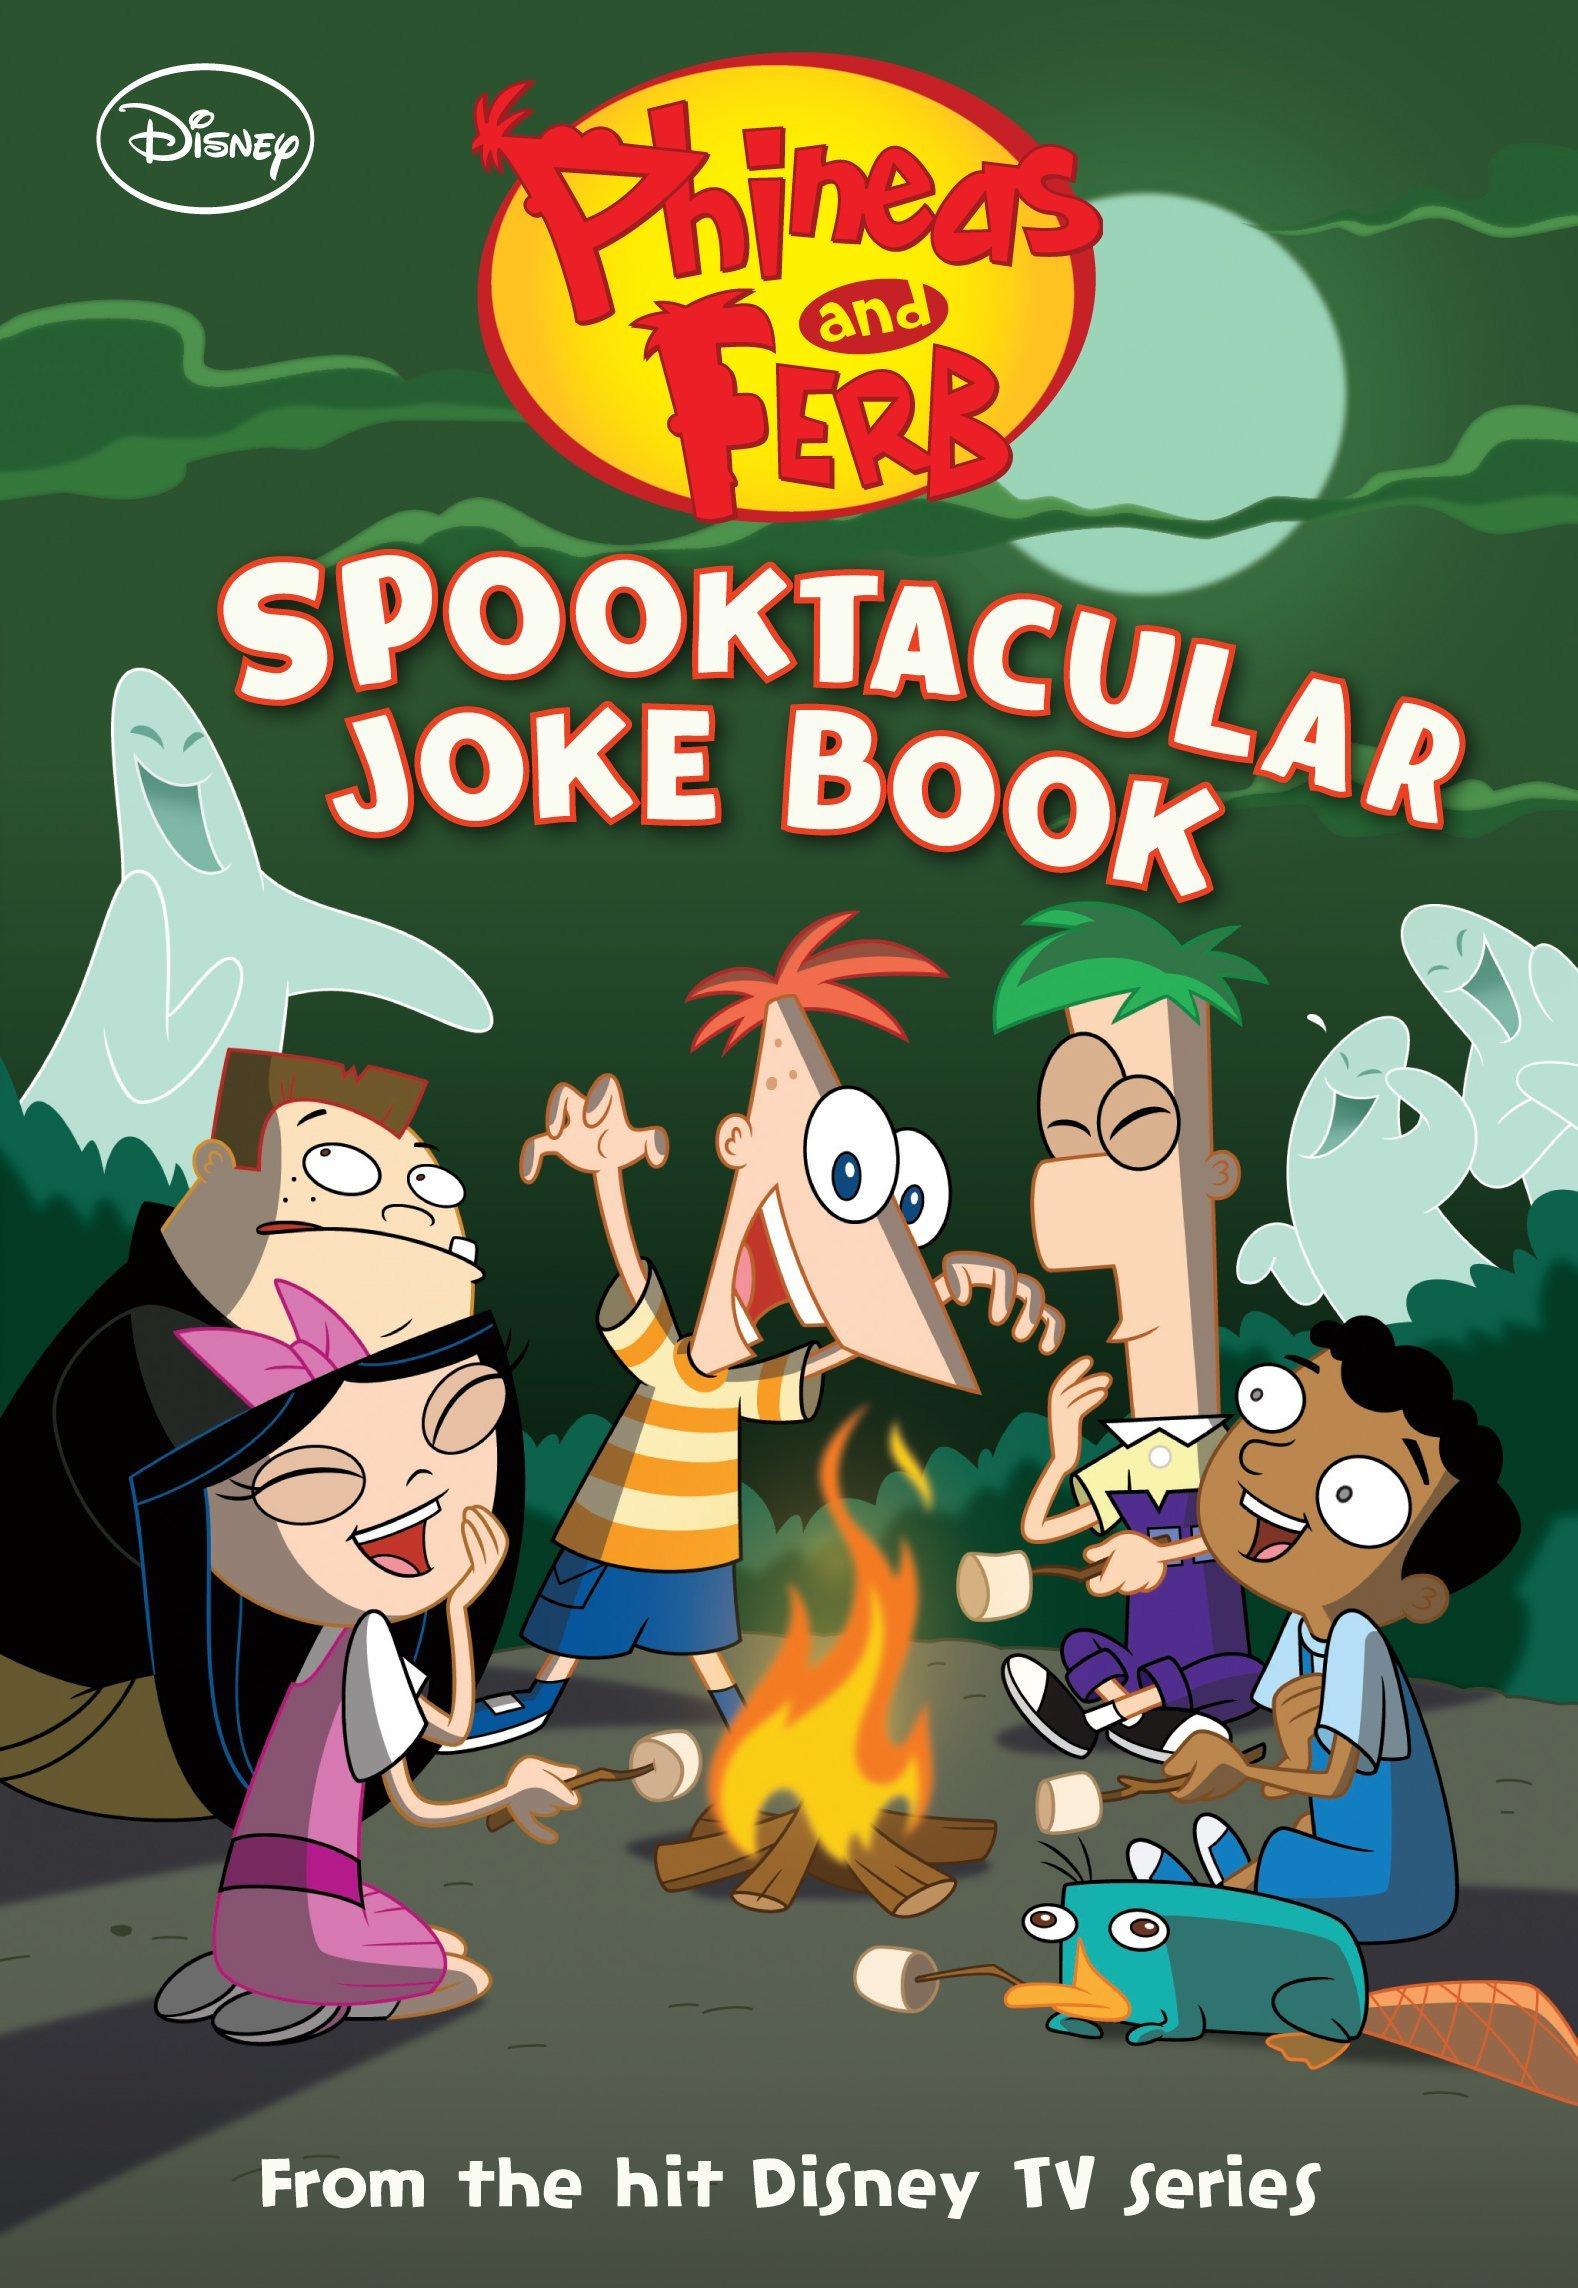 Spooktacular Joke Book